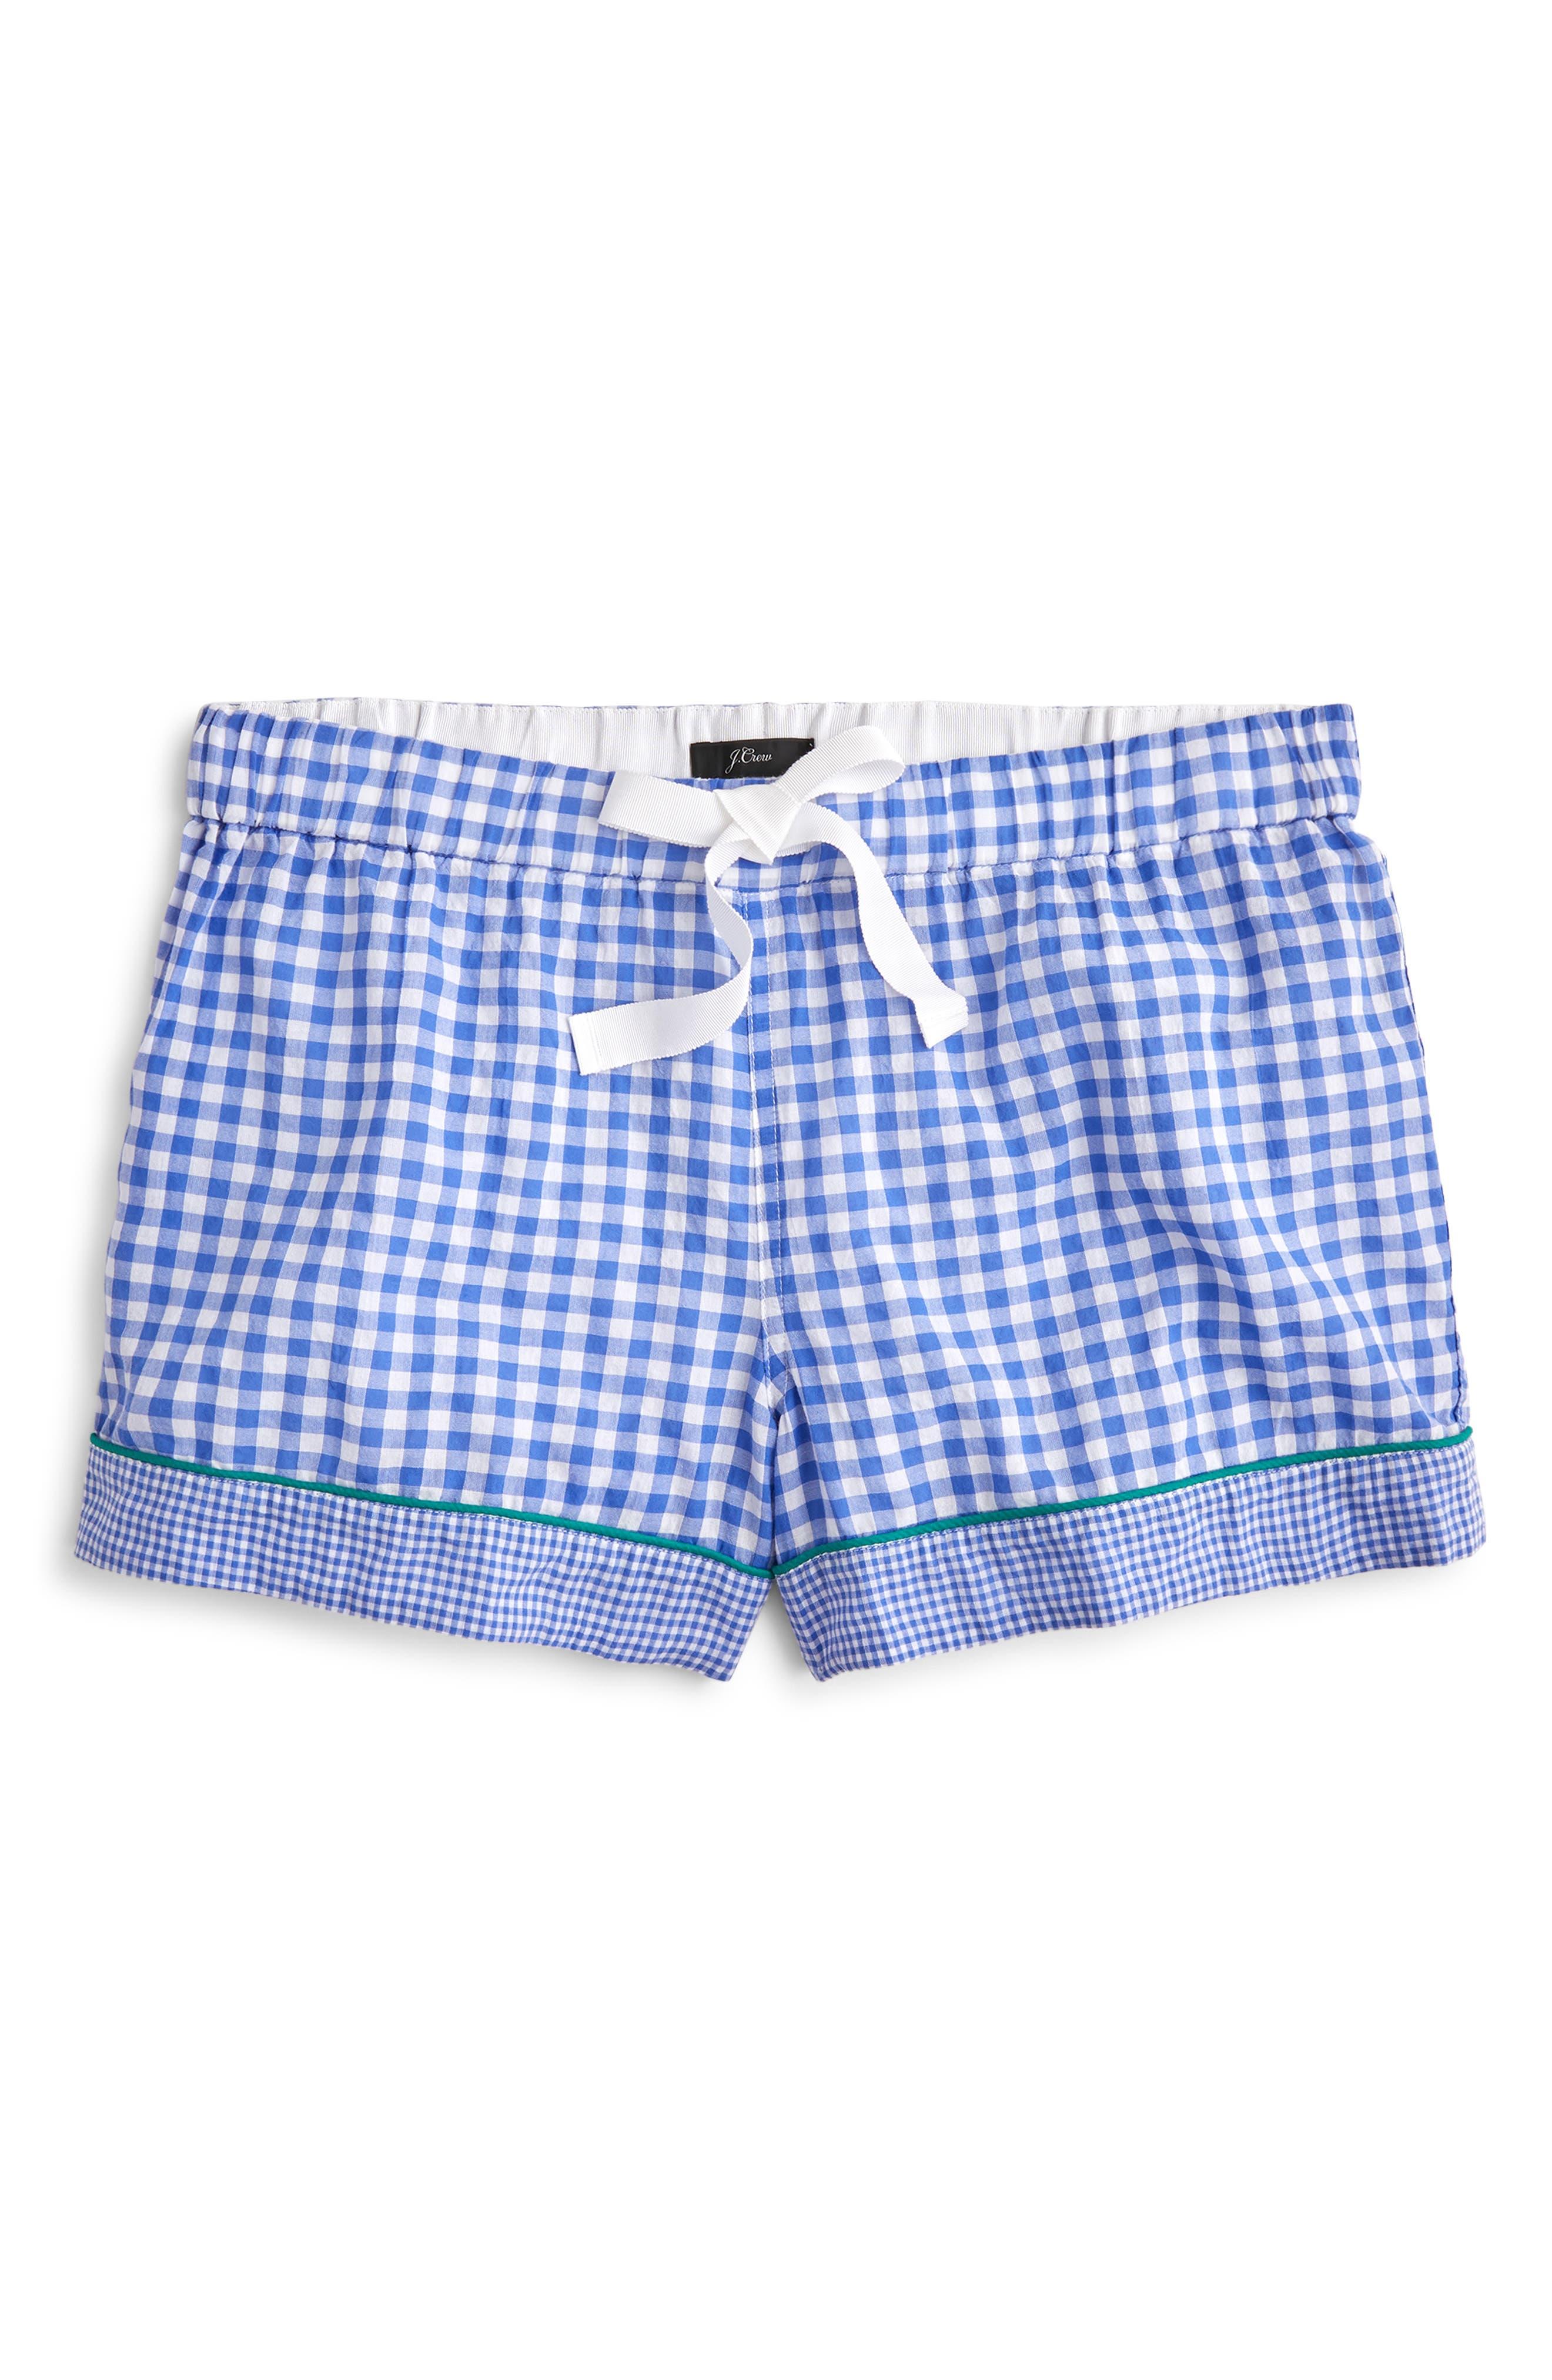 Plus Size J.crew Mixed Gingham Cotton Pajama Shorts, Size - Blue